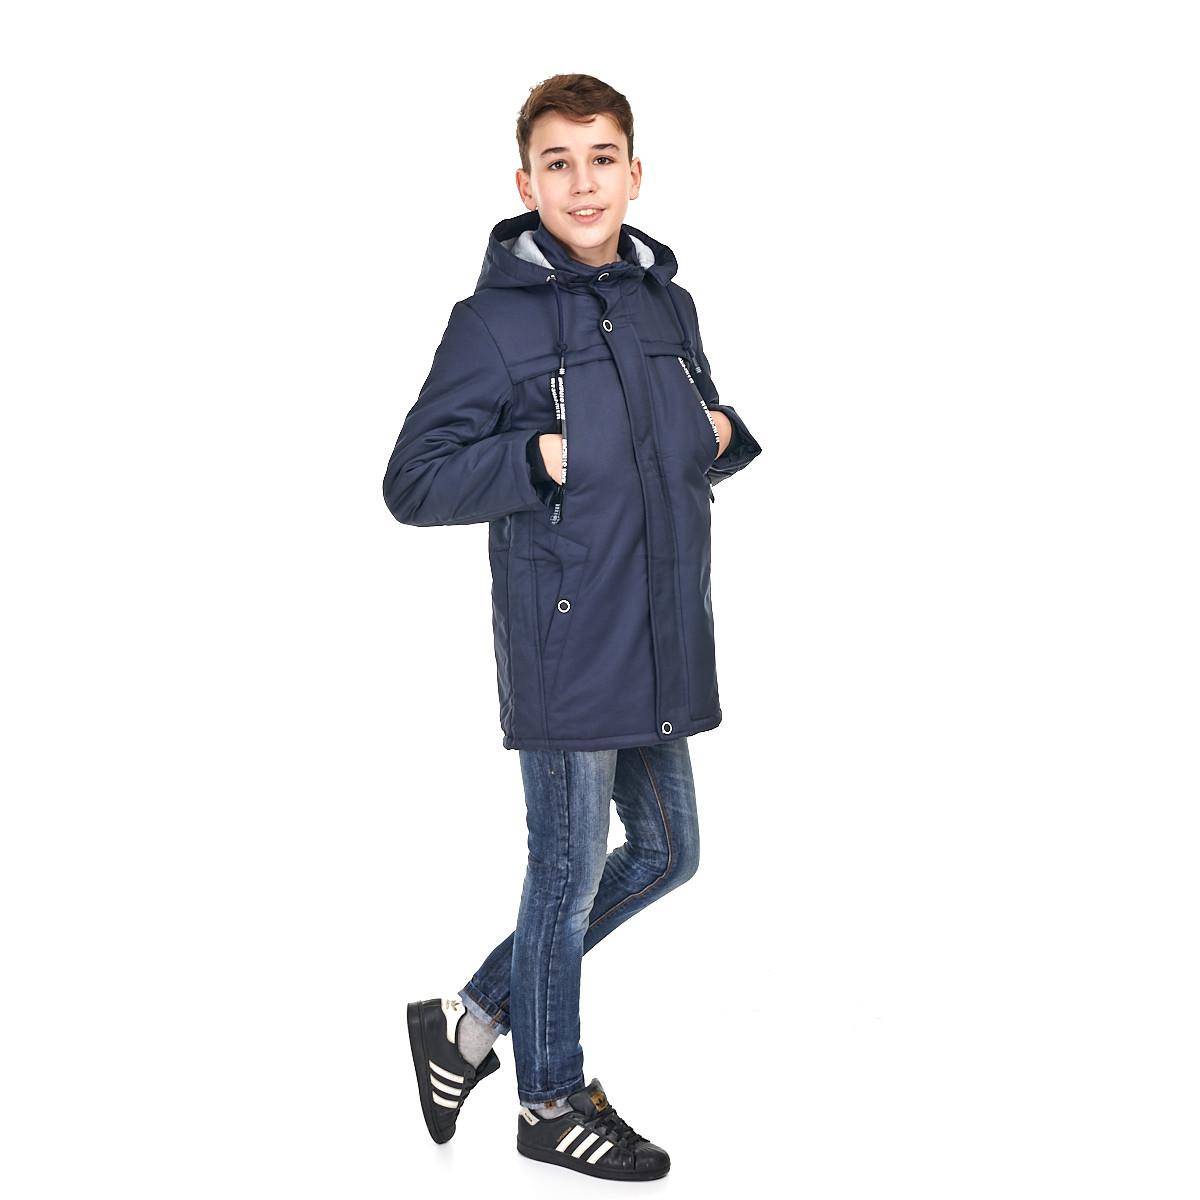 Весення куртка на мальчика 140 - 164, куркта с наушниками